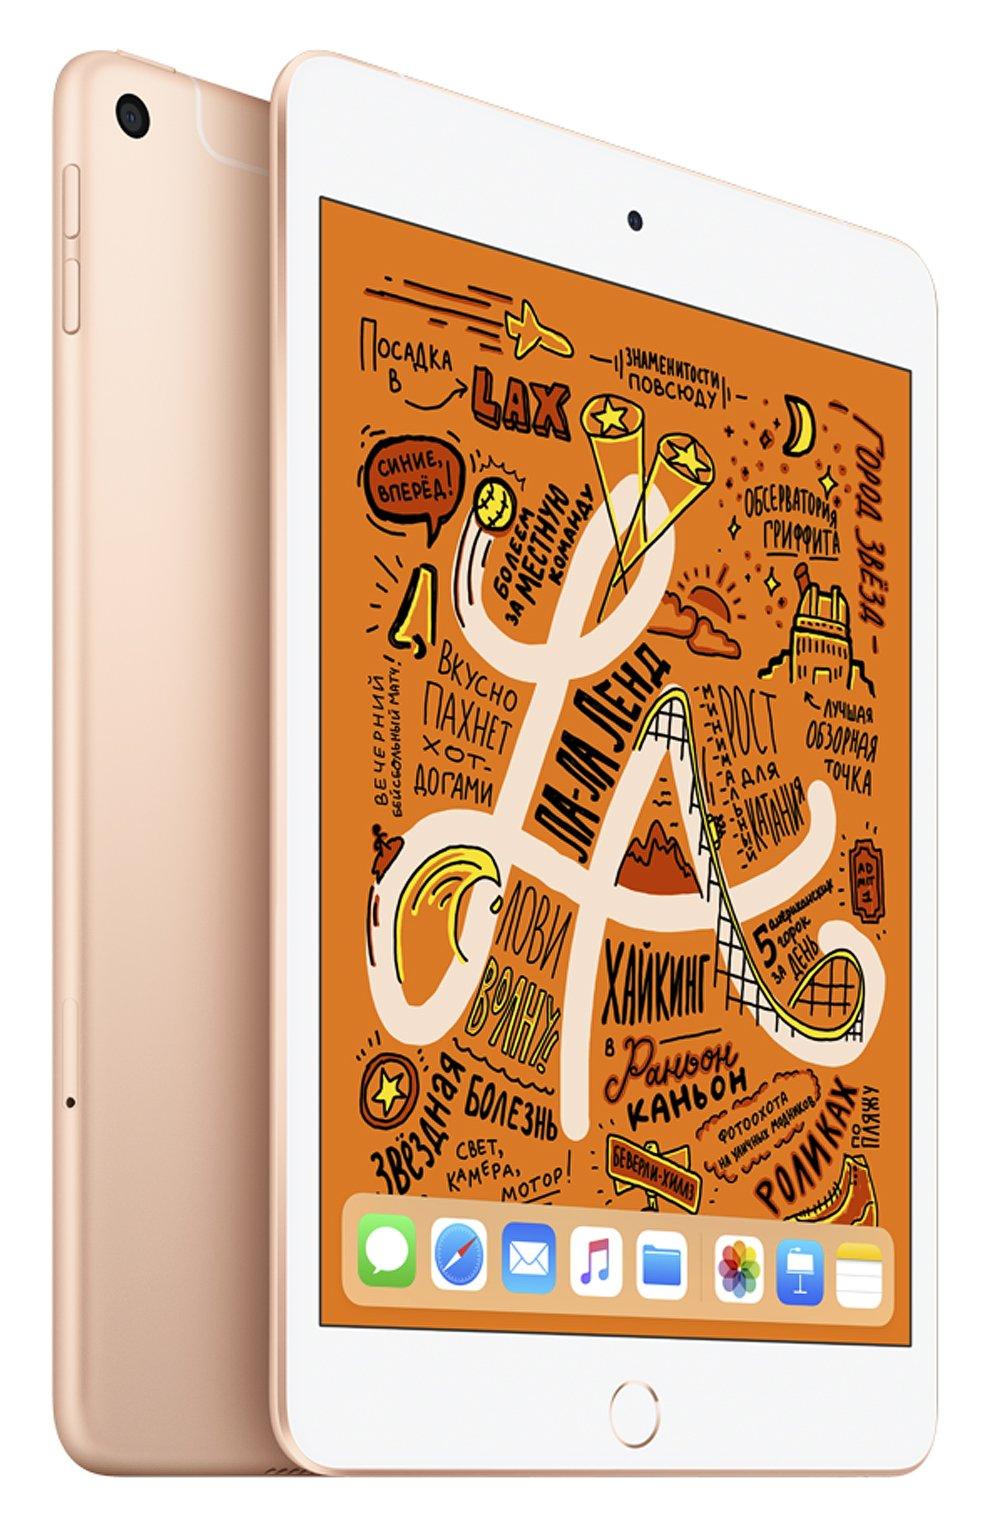 Ipad mini wi-fi + cellular 256gb gold APPLE  gold цвета, арт. MUXE2RU/A | Фото 1